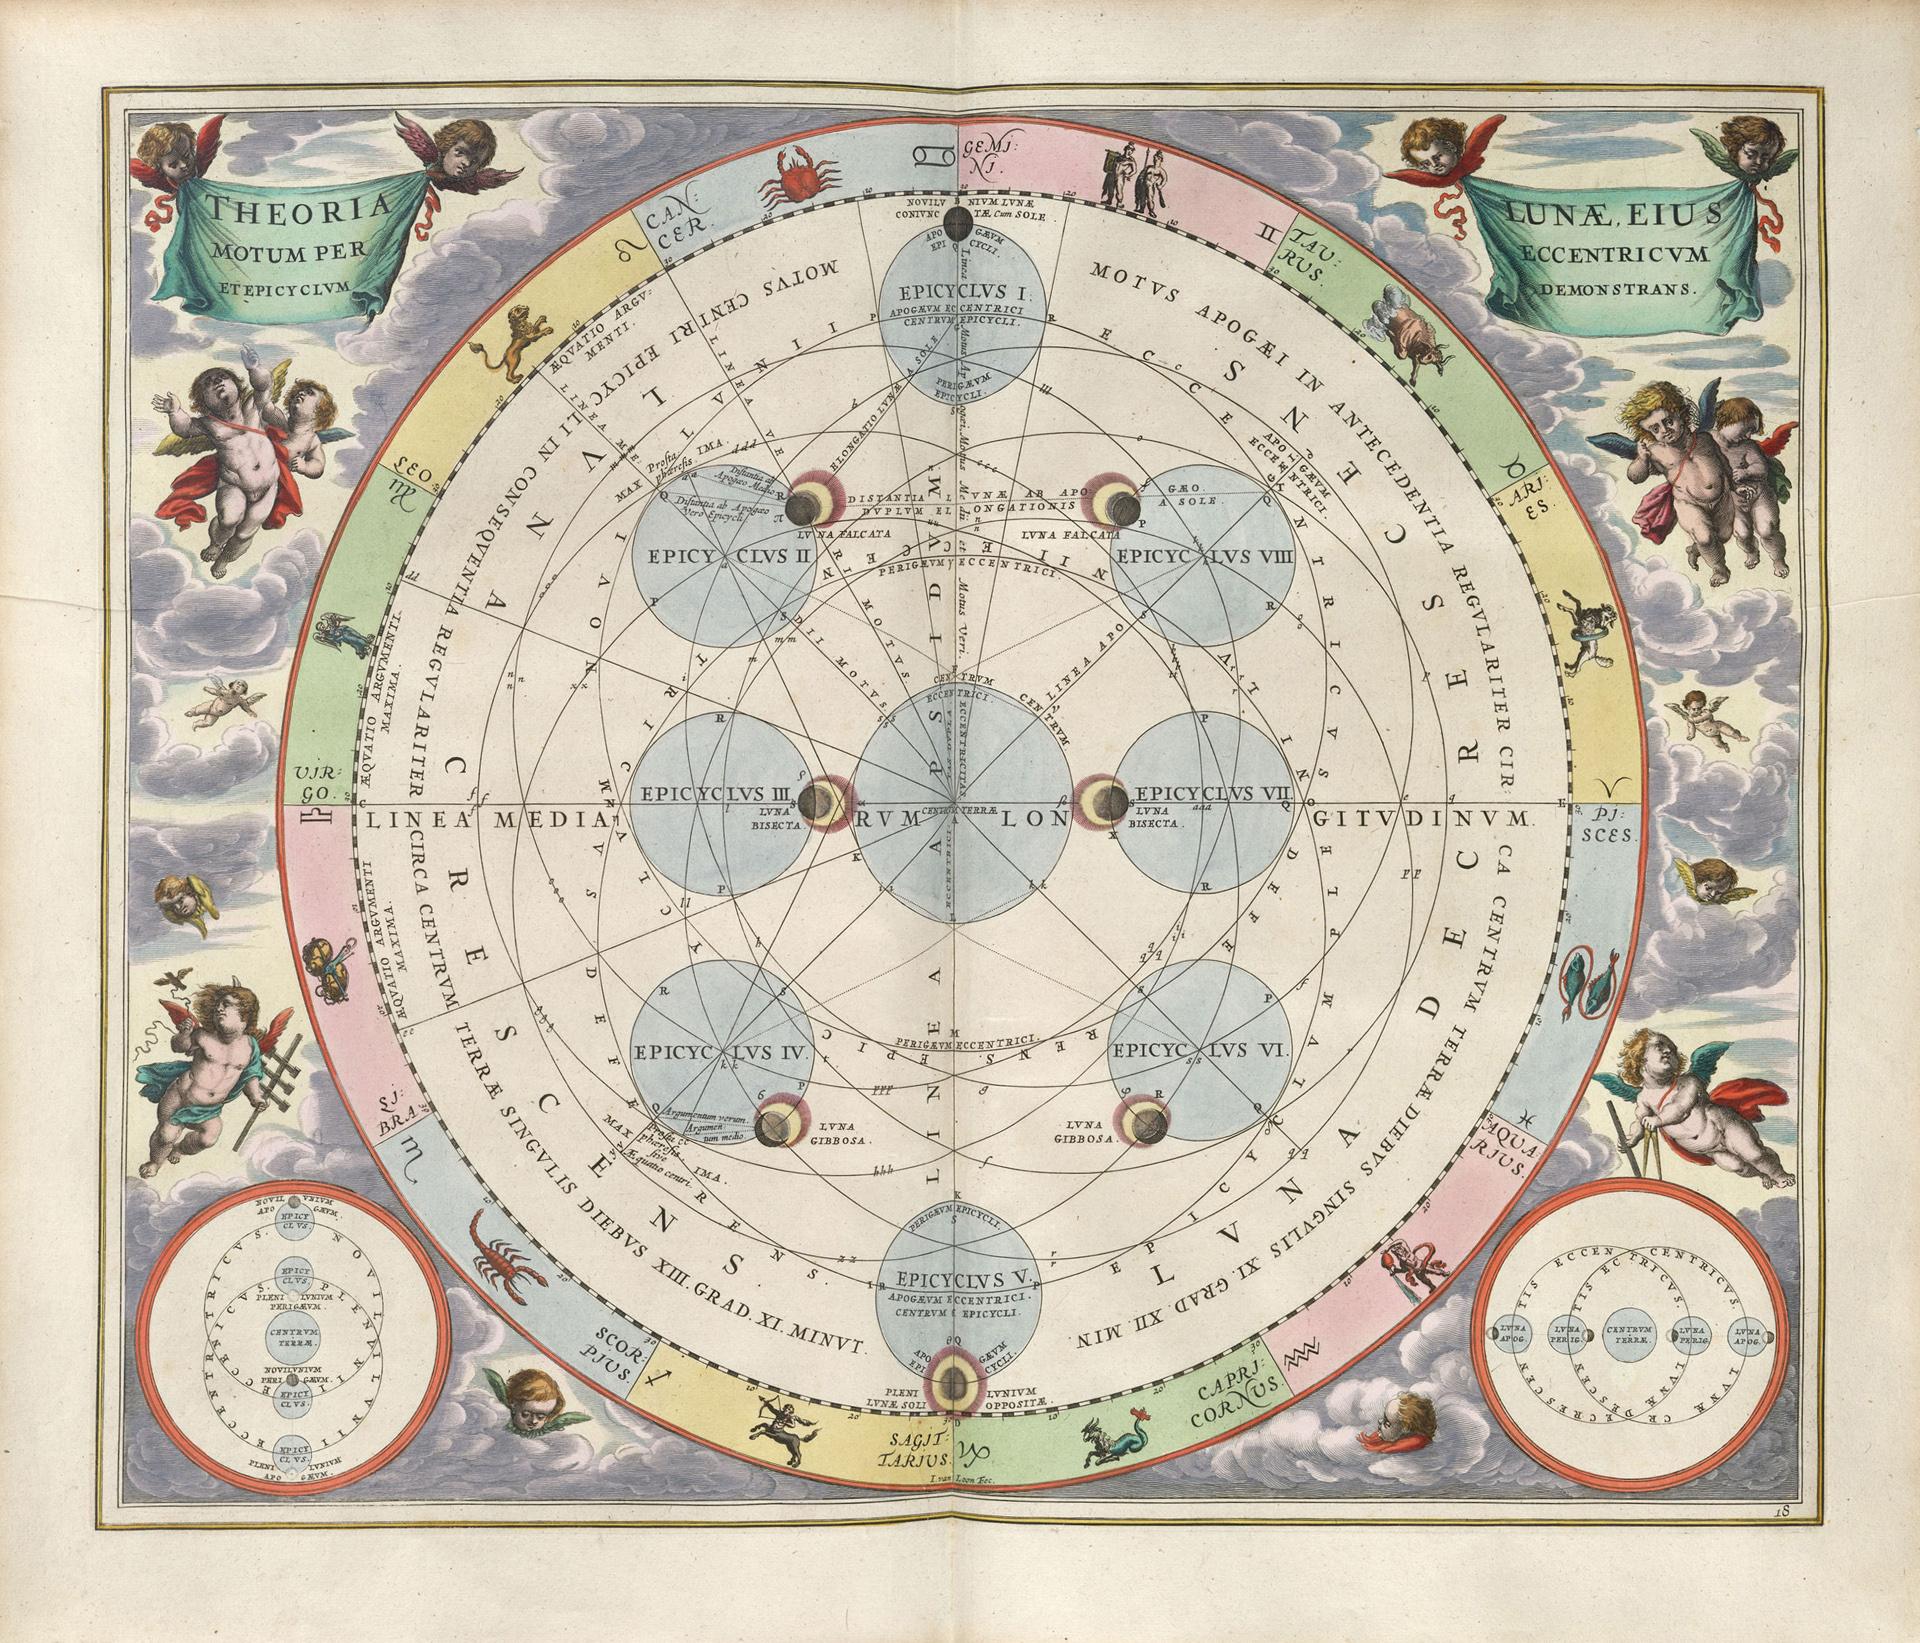 sm-Geocentricite-terre-centre-univers-carte-15